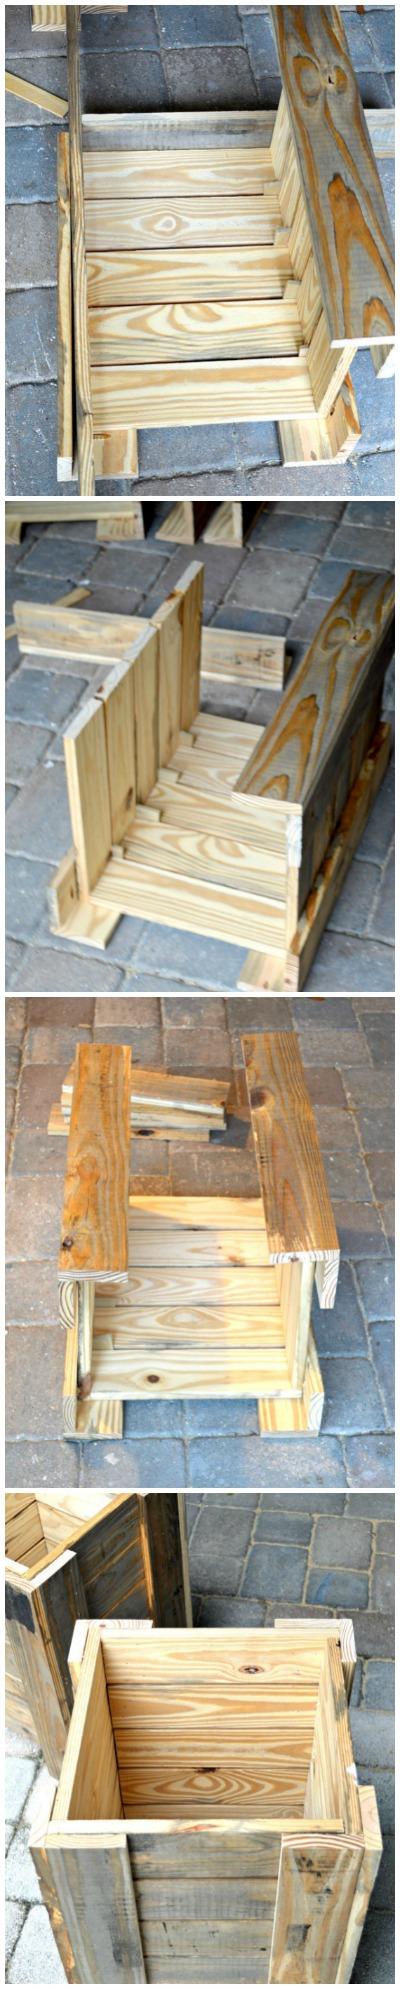 Step-to-build-wood-planter-box-H2OBungalow